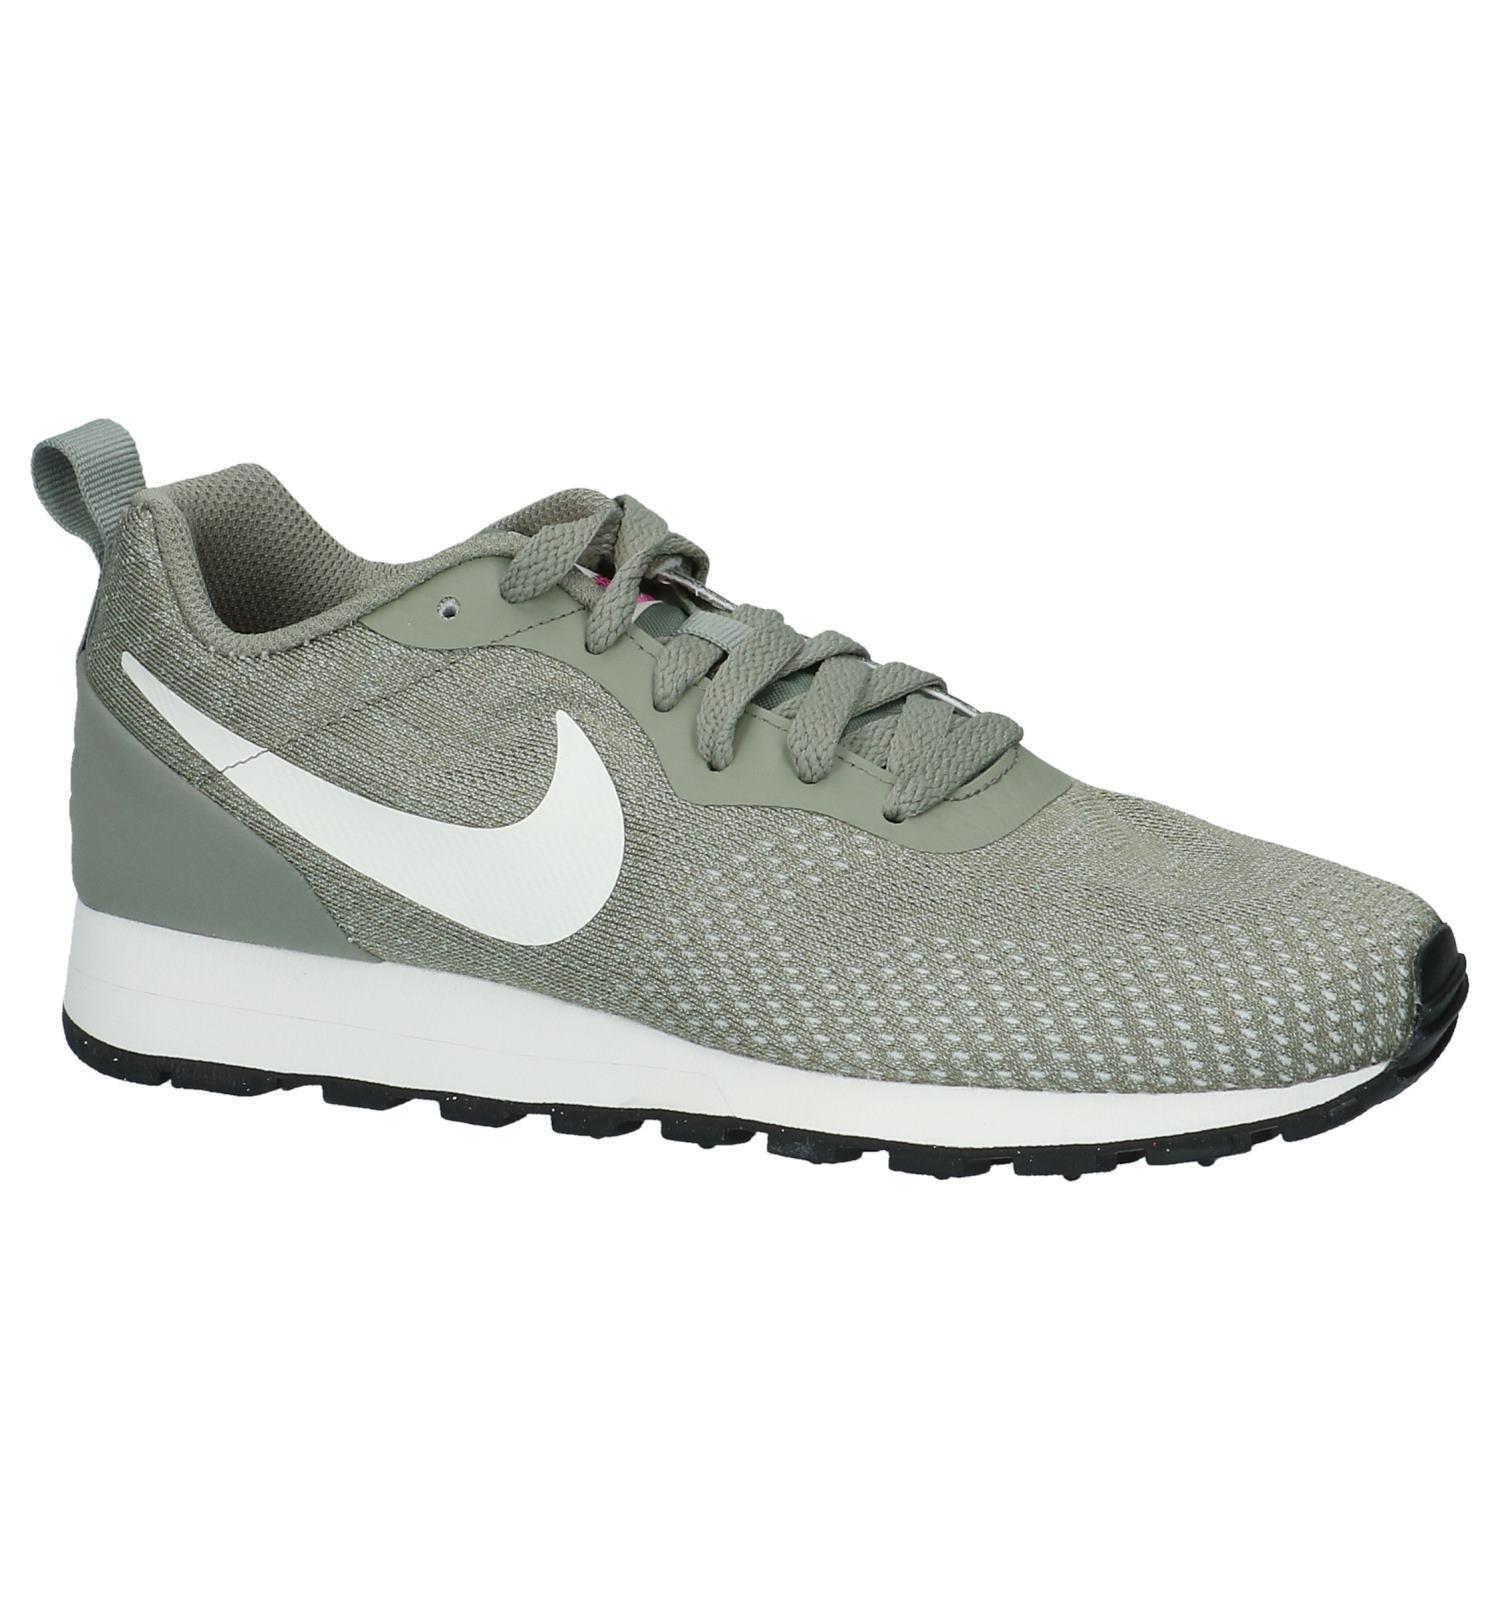 4a0e005783b Kaki Lage Sportieve Sneakers Nike MD Runner   TORFS.BE   Gratis verzend en  retour